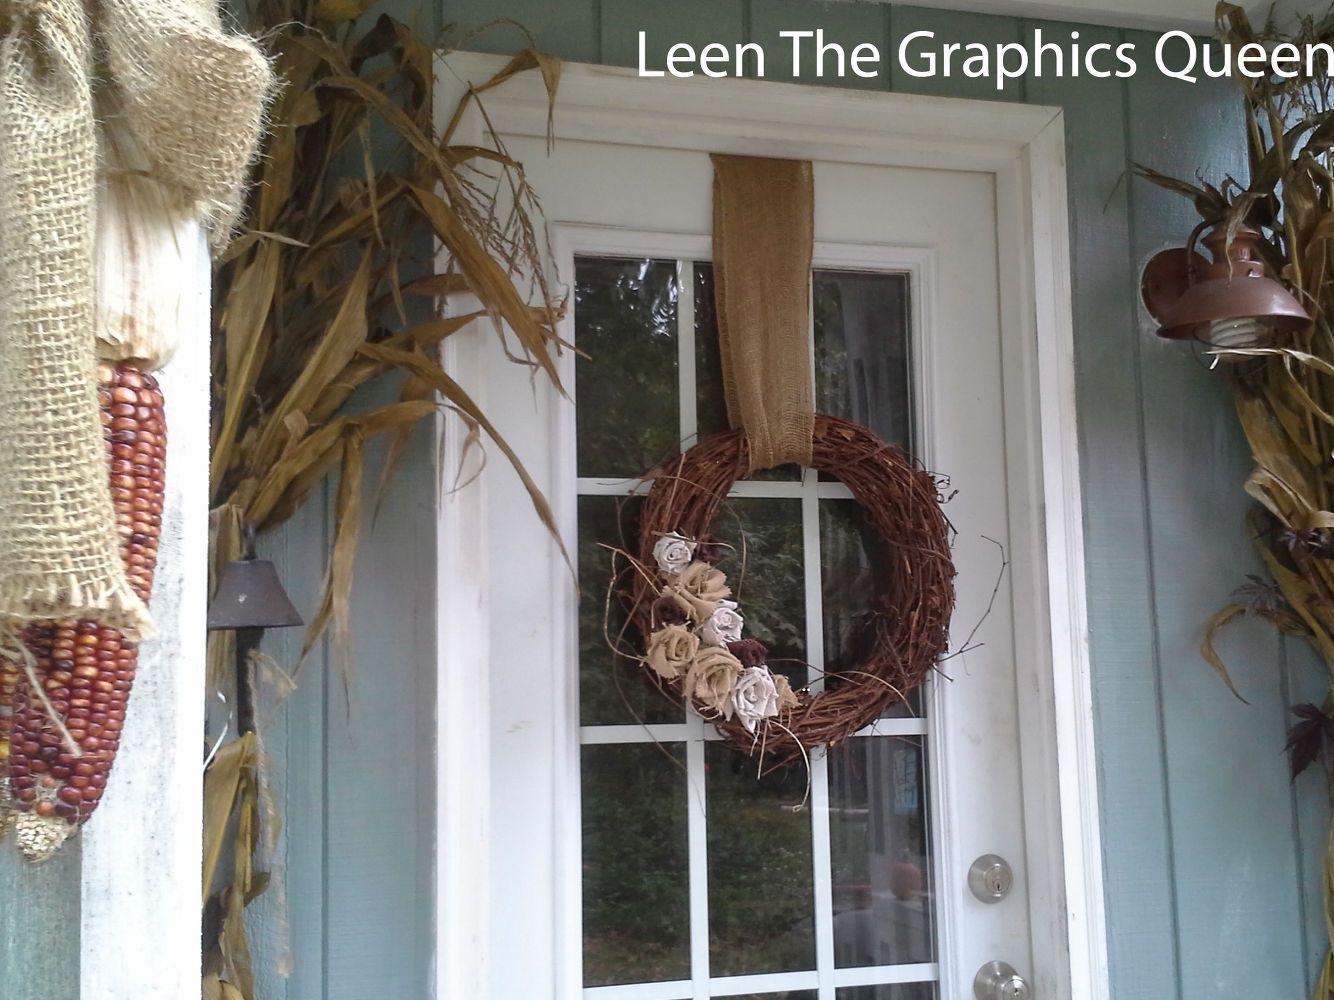 Hometalk diy christmas window decoration - Home And Garden Diy Ideas Photos And Answers Hometalk